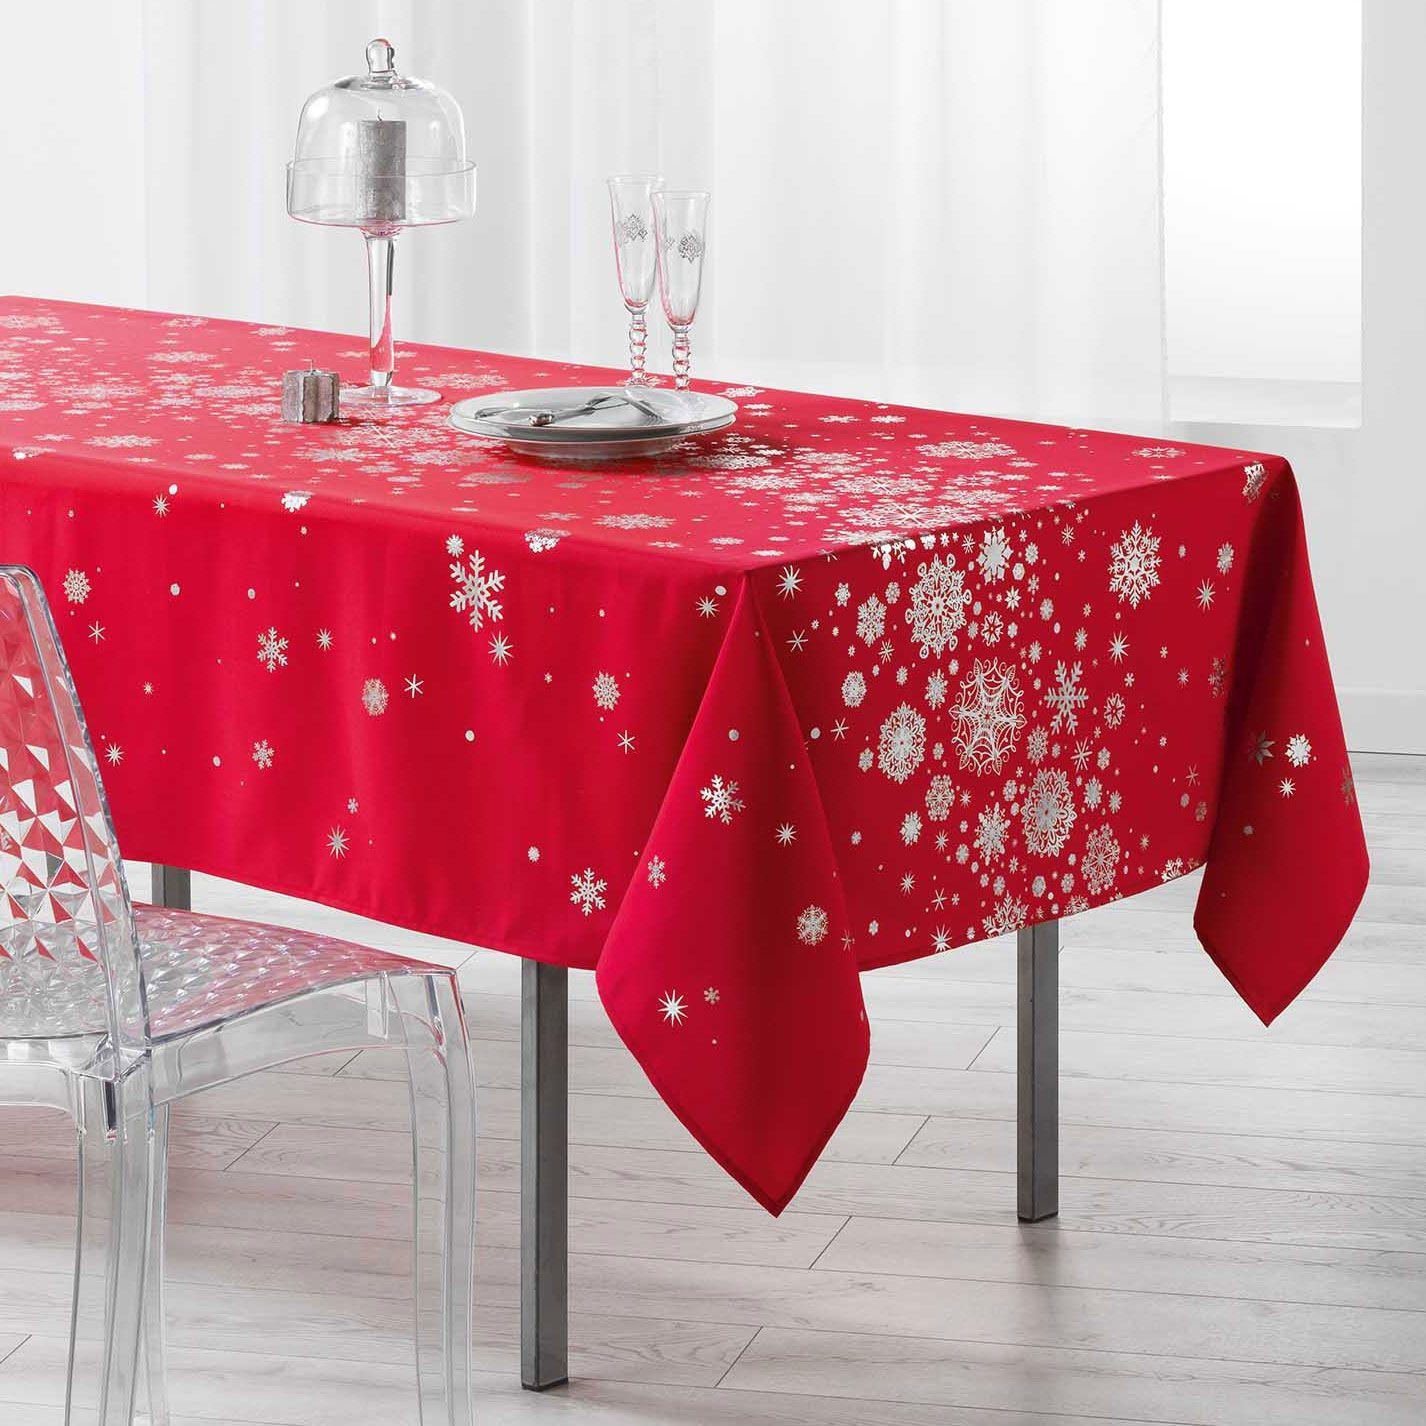 nappe rectangulaire l300 cm constellation rouge linge de table eminza. Black Bedroom Furniture Sets. Home Design Ideas